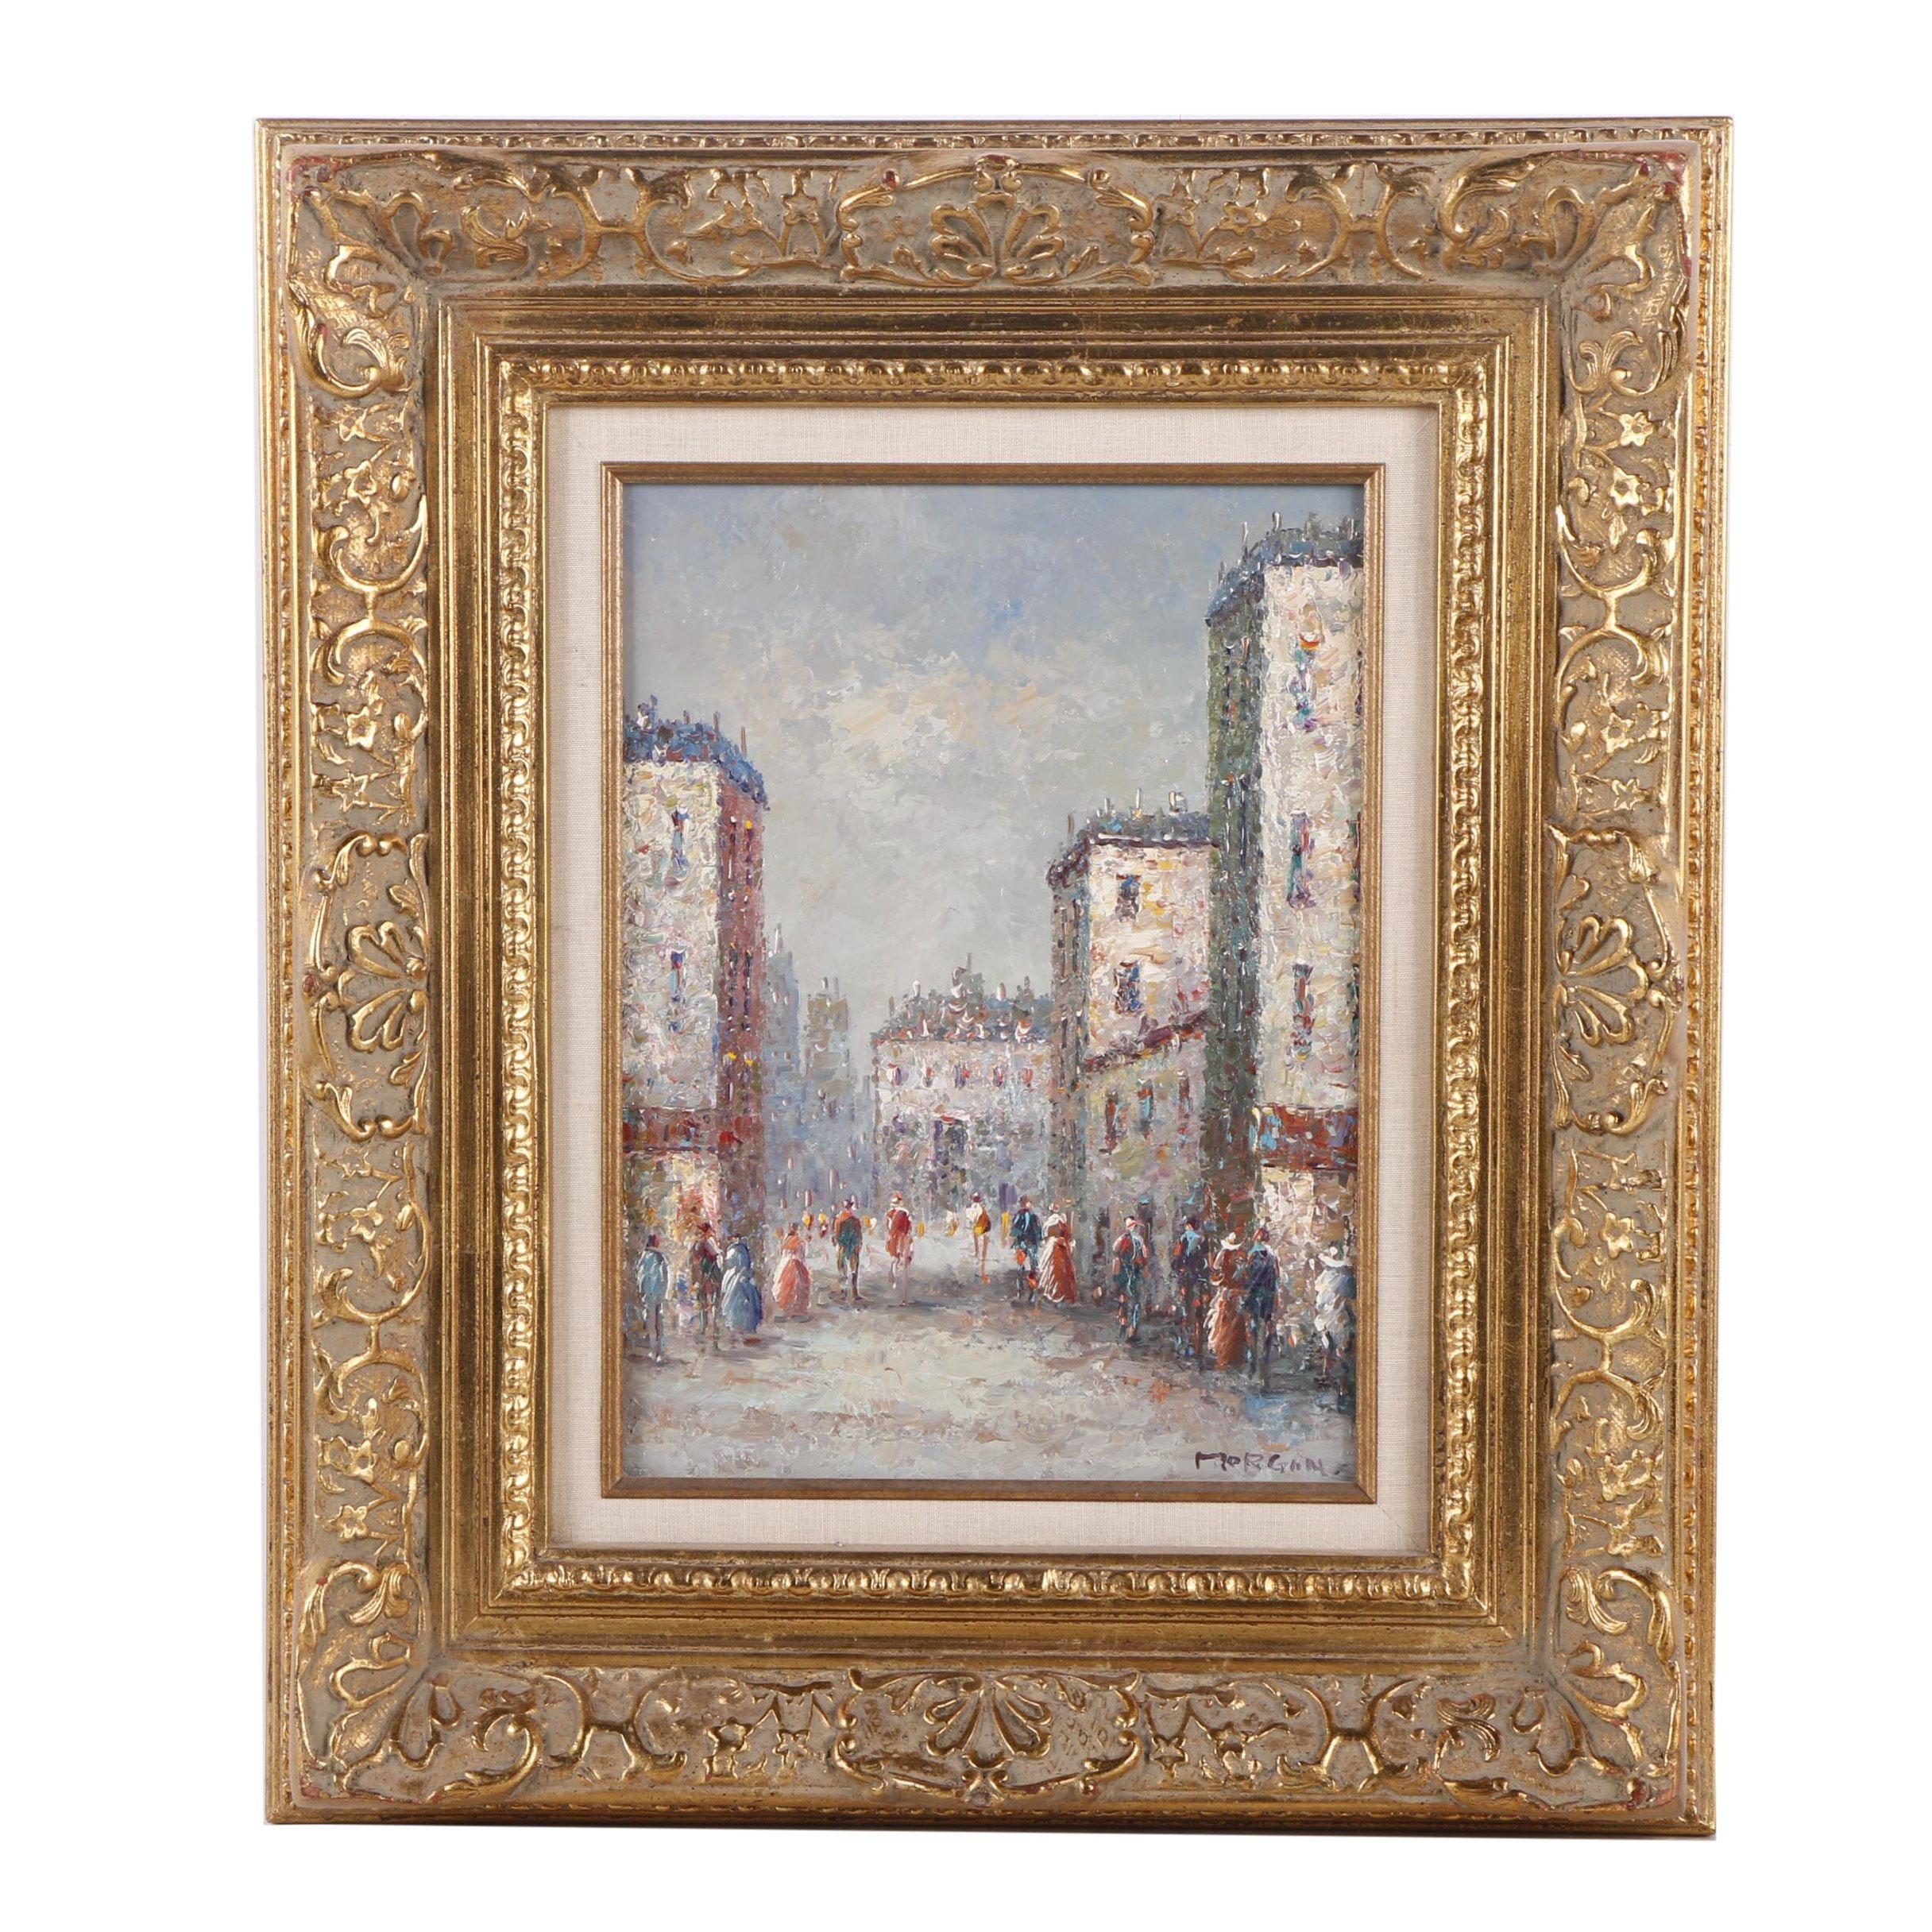 Morgan Oil Painting of a Street Scene